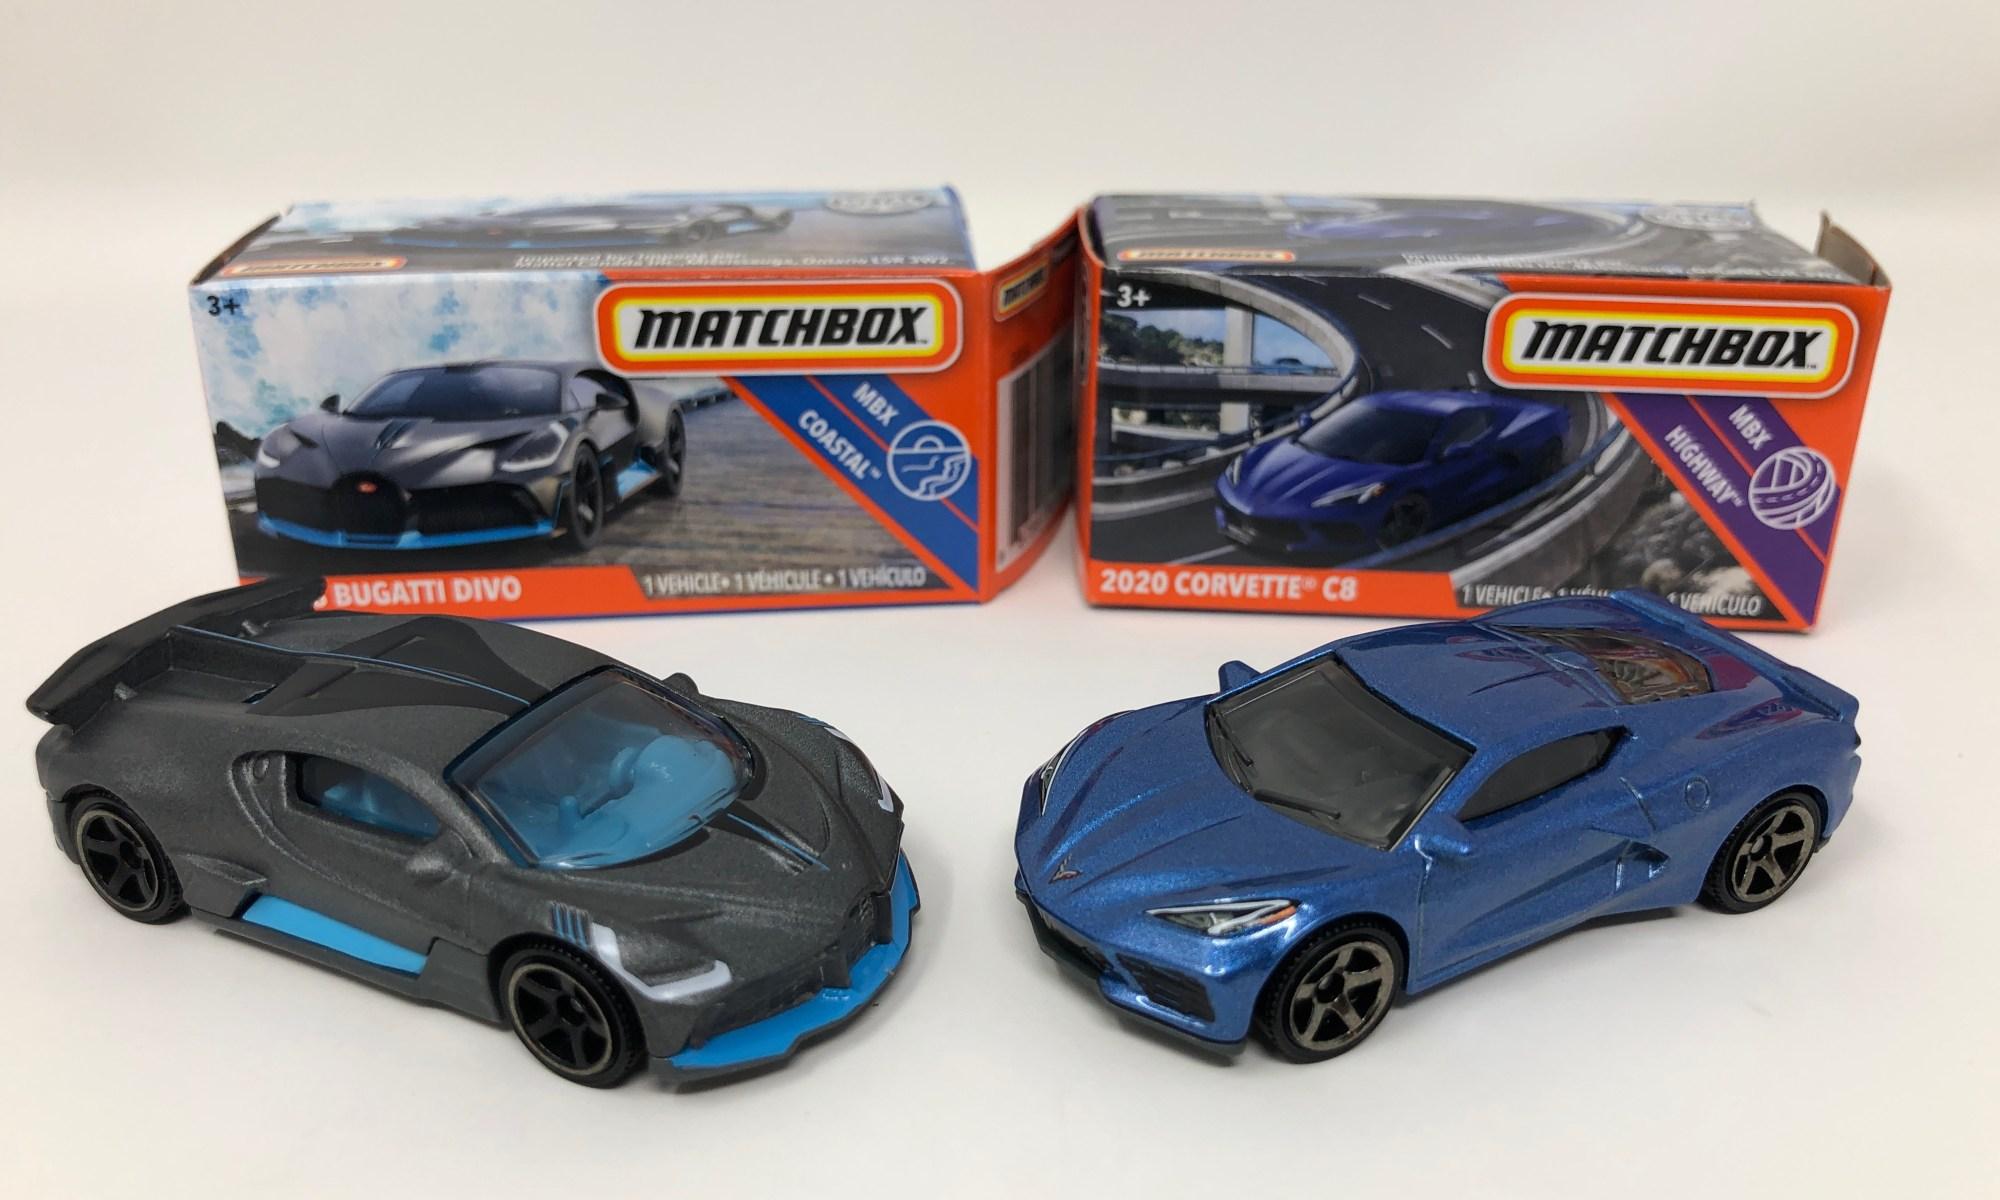 Finally Bugatti Here Is The Final Matchbox Mix Of 2020 Lamleygroup